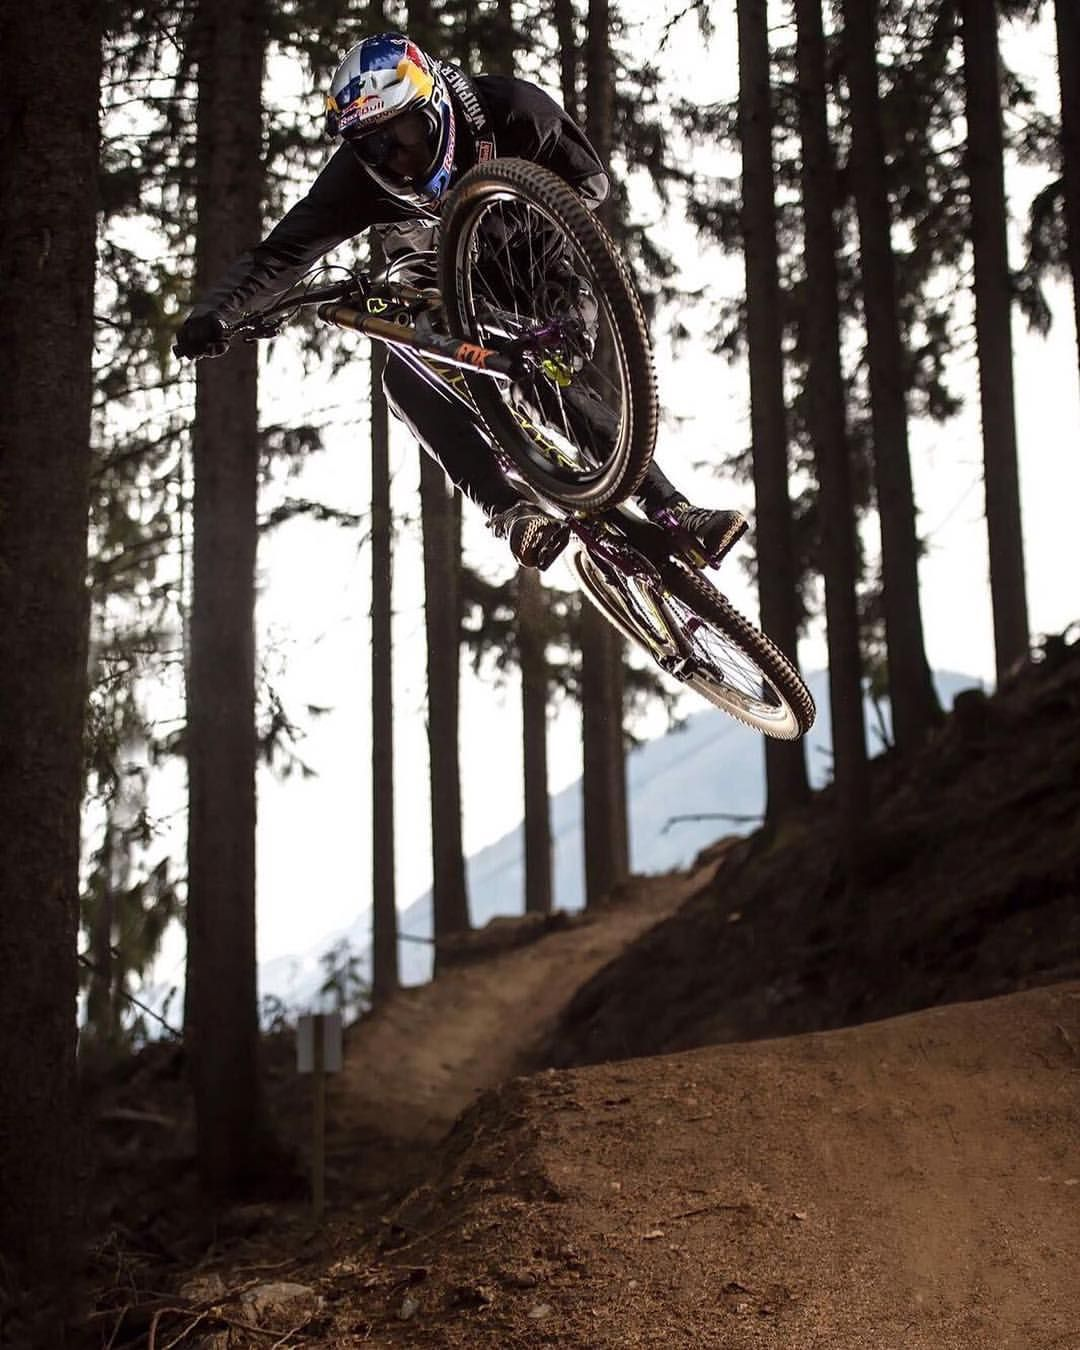 25 1k Likes 67 Comments Fabio Wibmer Wibmerfabio On Instagram Sending It Into The Week Pc Honne86 Specialized Demo Downhill Mountainbike